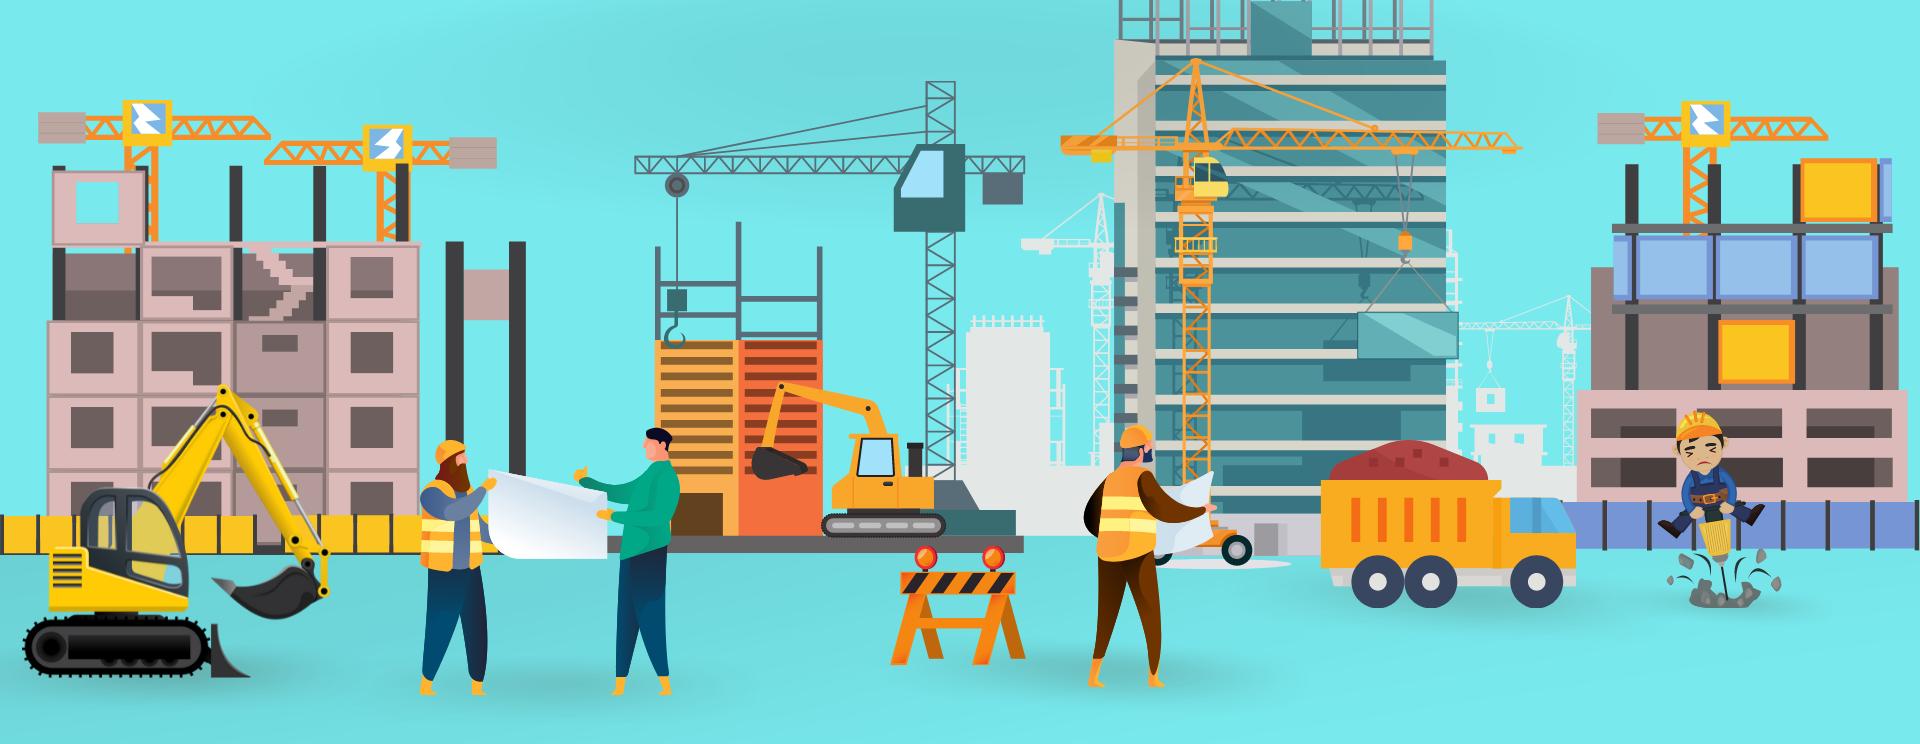 Construction Landing Page Website Banner